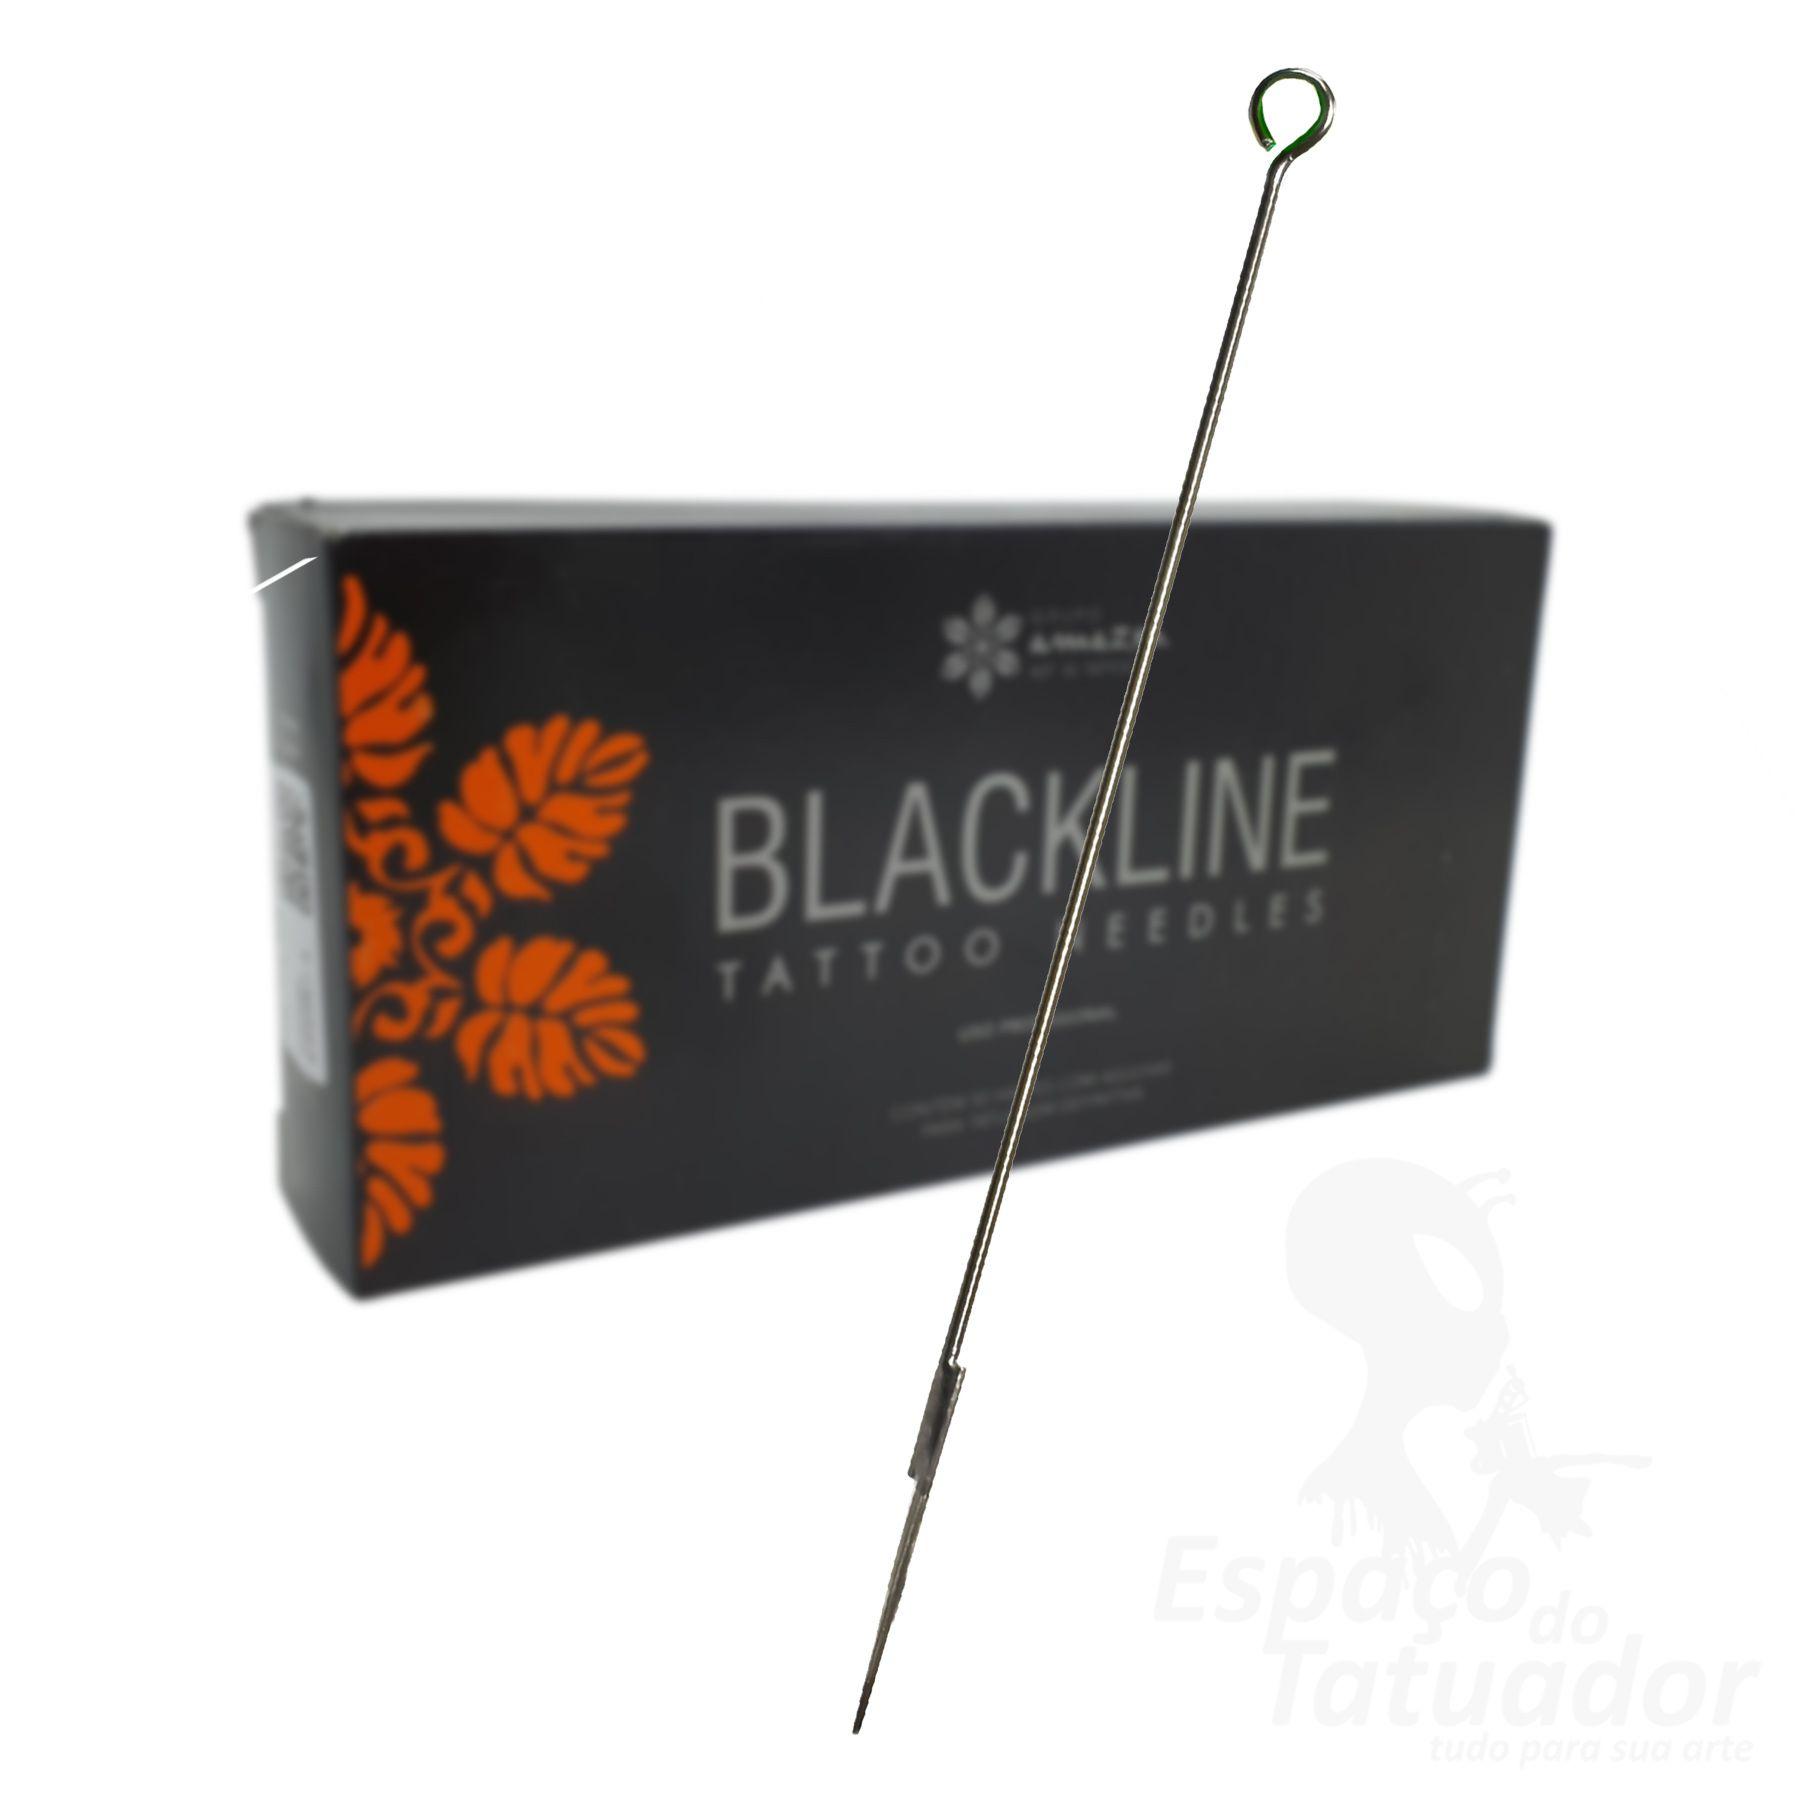 Agulha Black Line - RL 1203 - Unidade